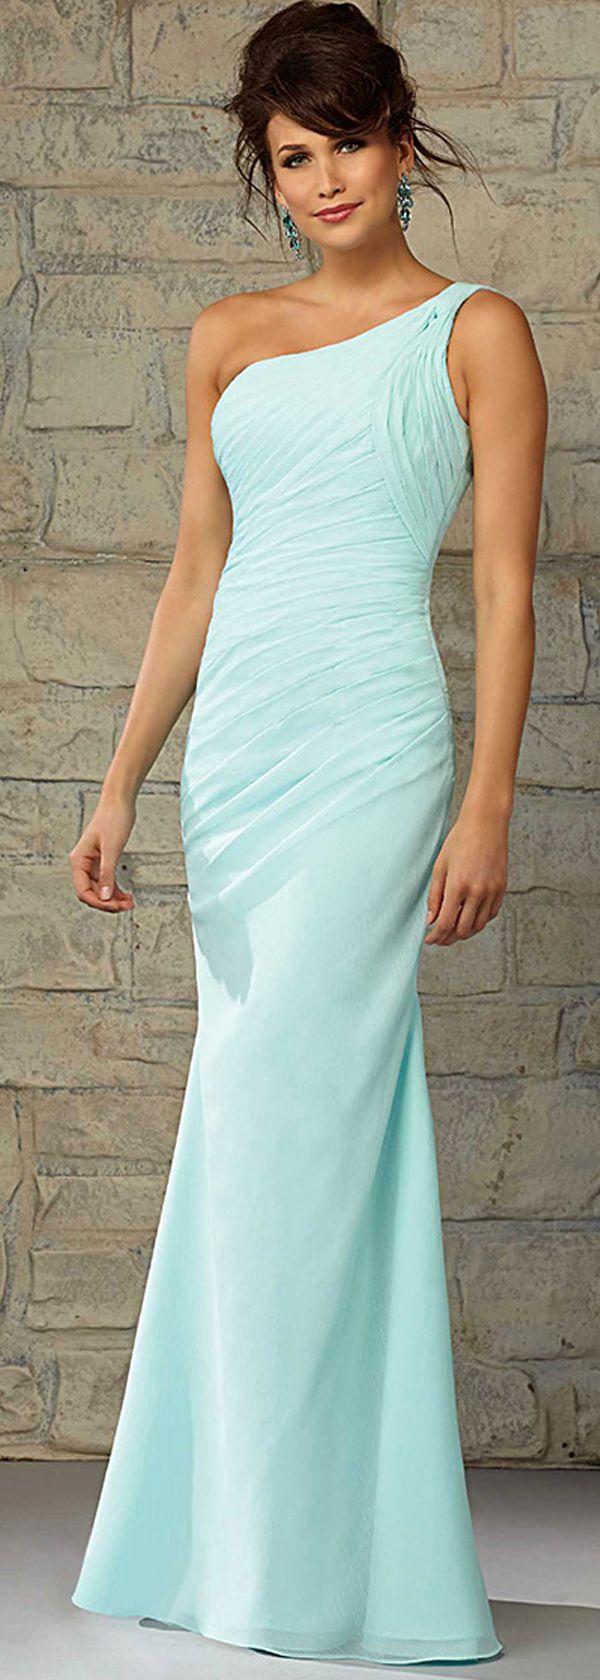 48 best wedding dresses images on pinterest bridal dresses charming chiffon one shoulder neckline floor length sheath bridesmaid dress ombrellifo Choice Image